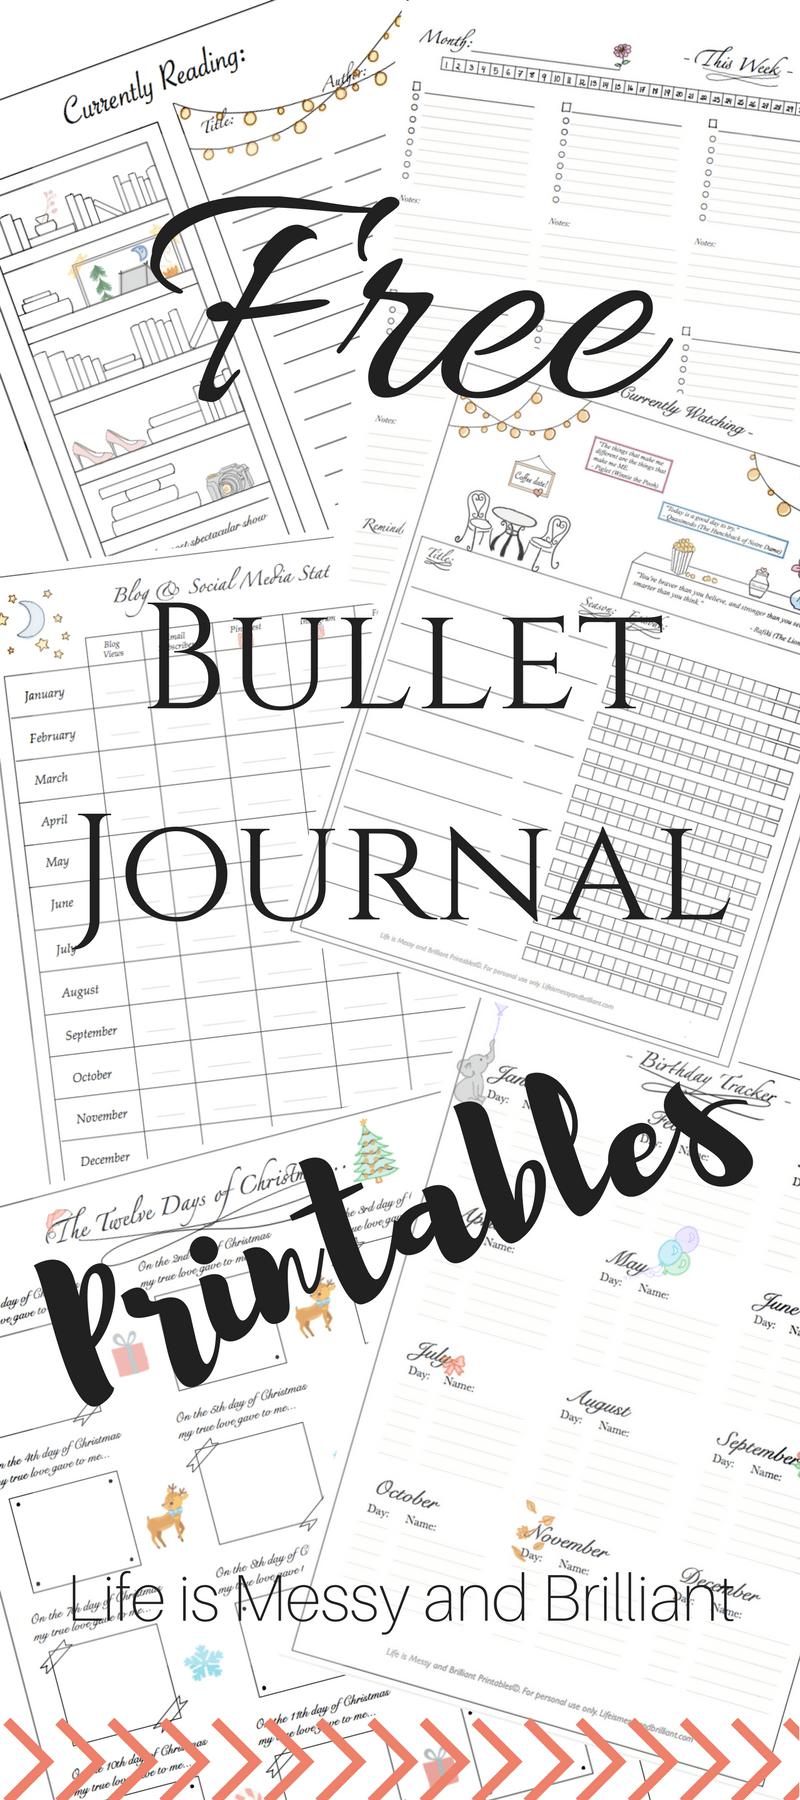 image about Bullet Journal Symbols Printable titled No cost Bullet Magazine Printables Bullet magazine symbols